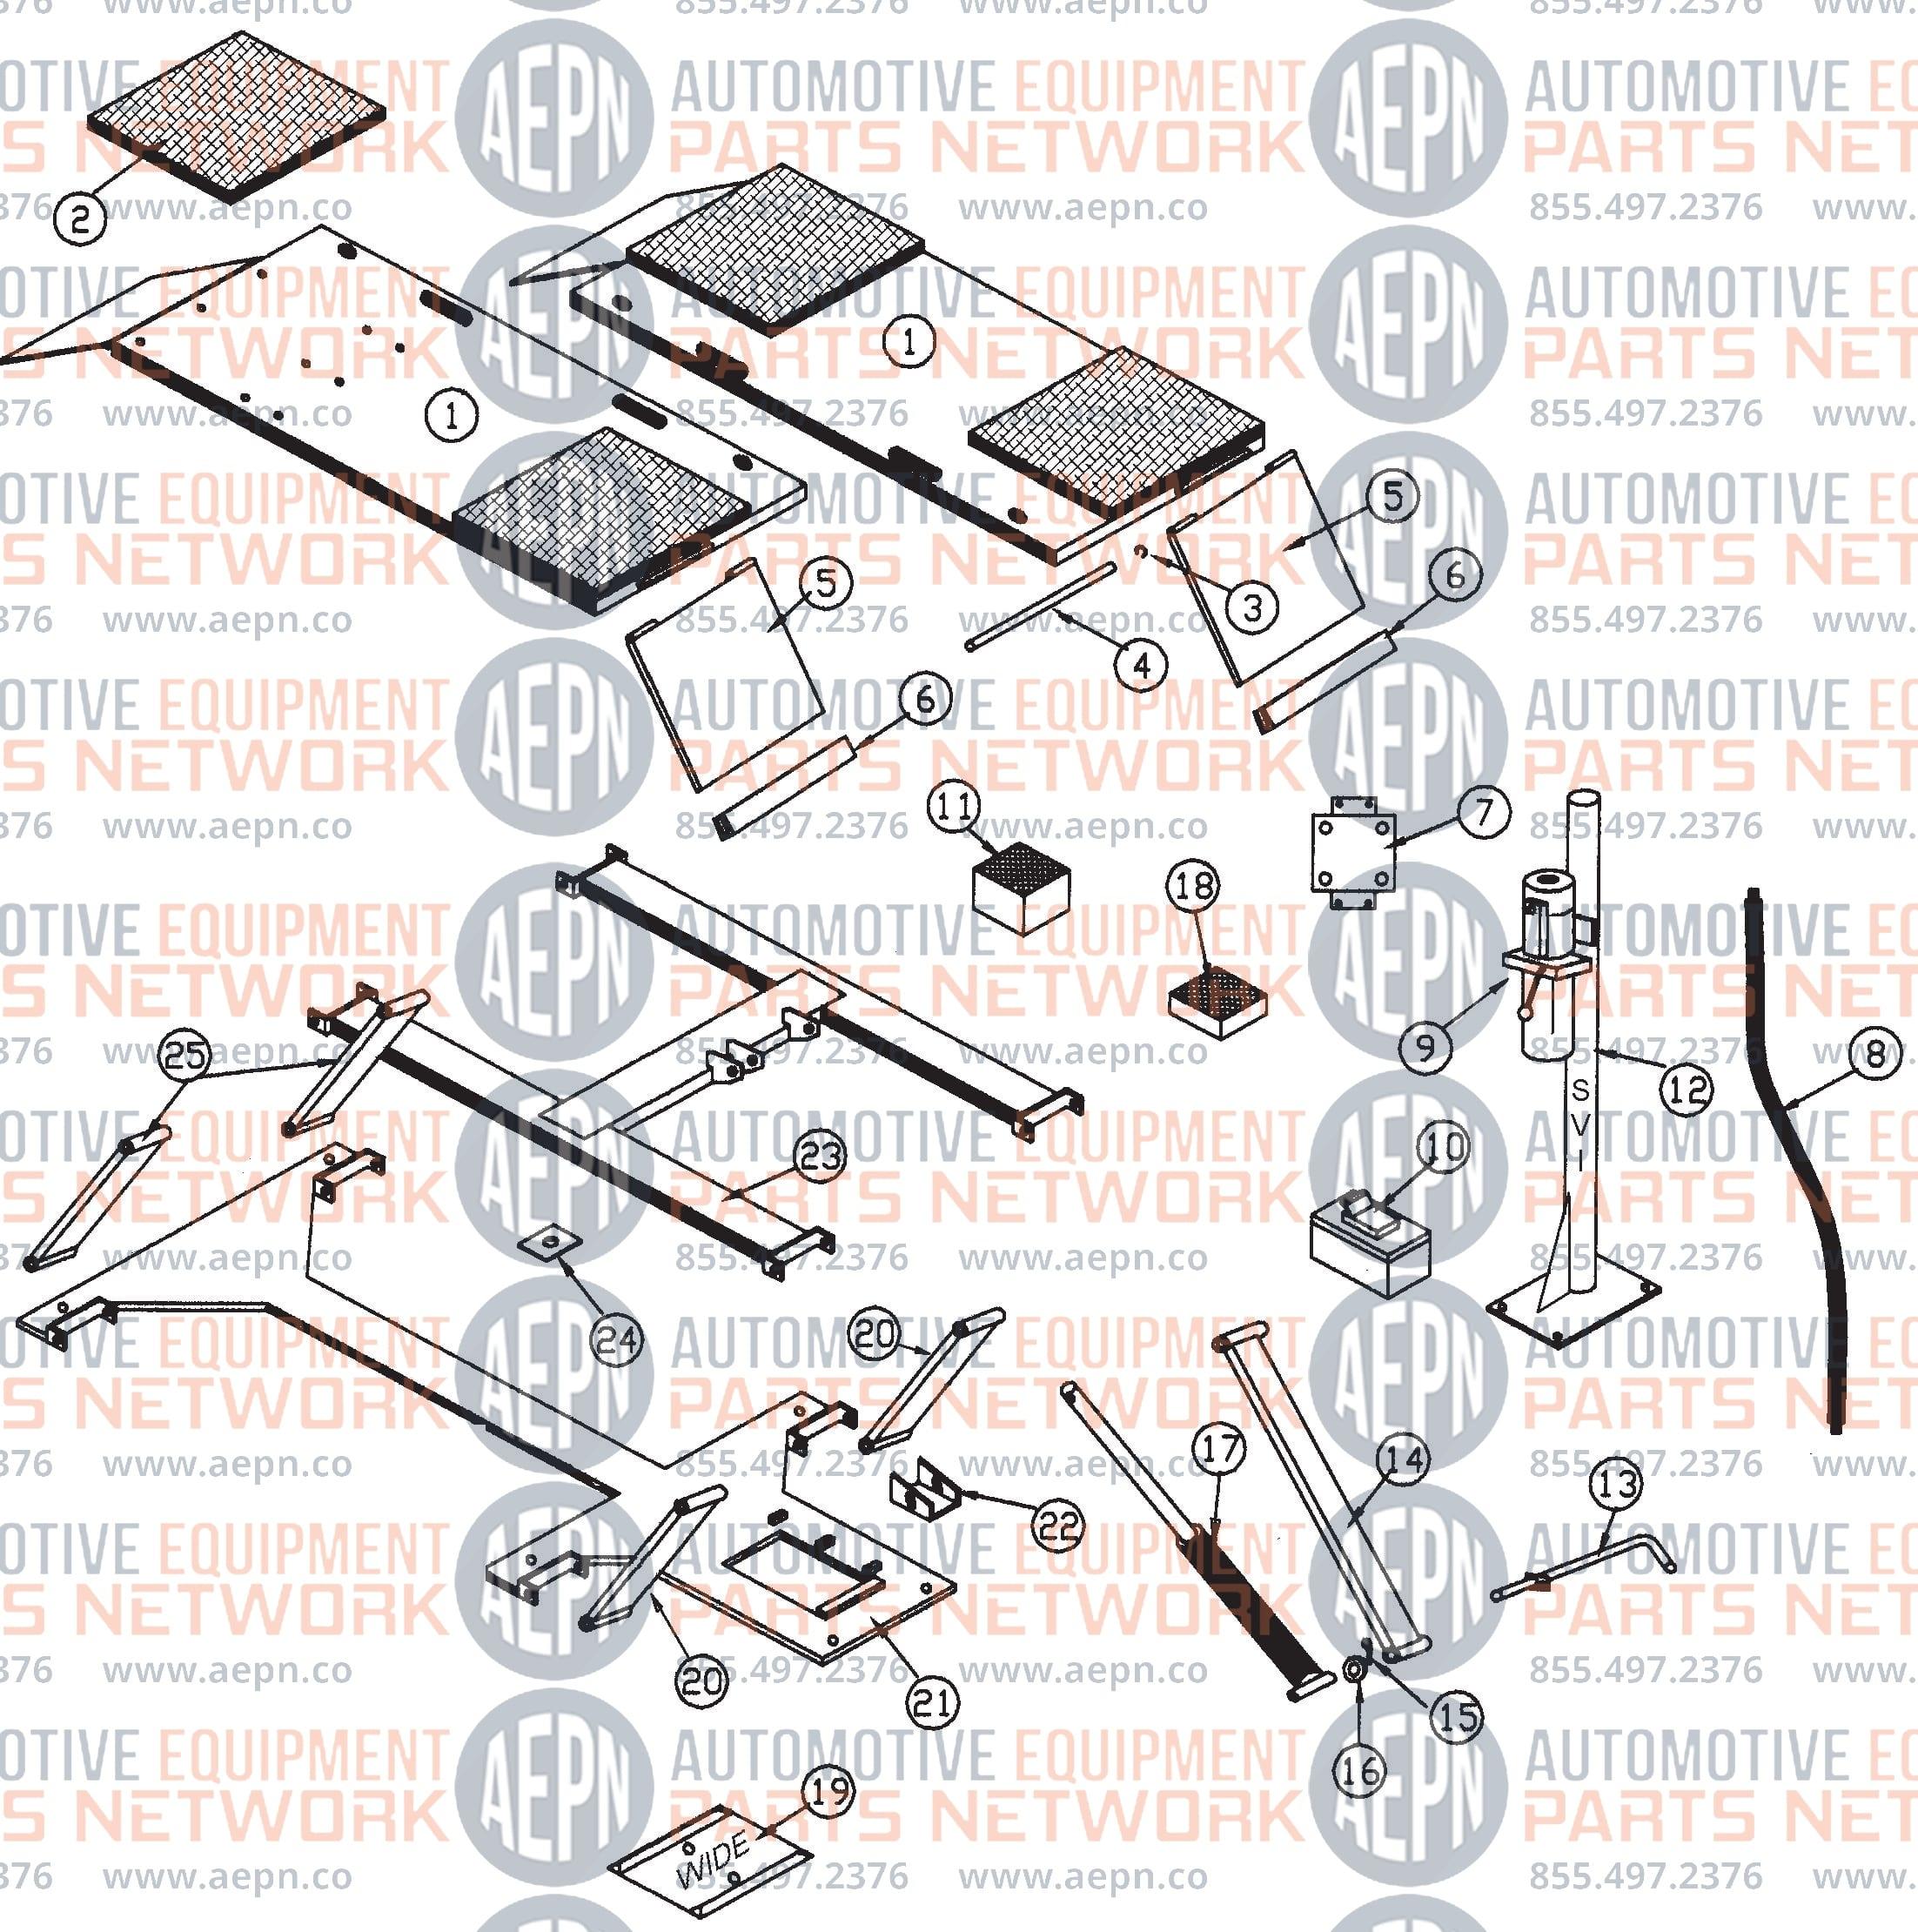 rotary vlxs6 parts breakdown manual typewriter parts diagram rotary phone parts diagram #13